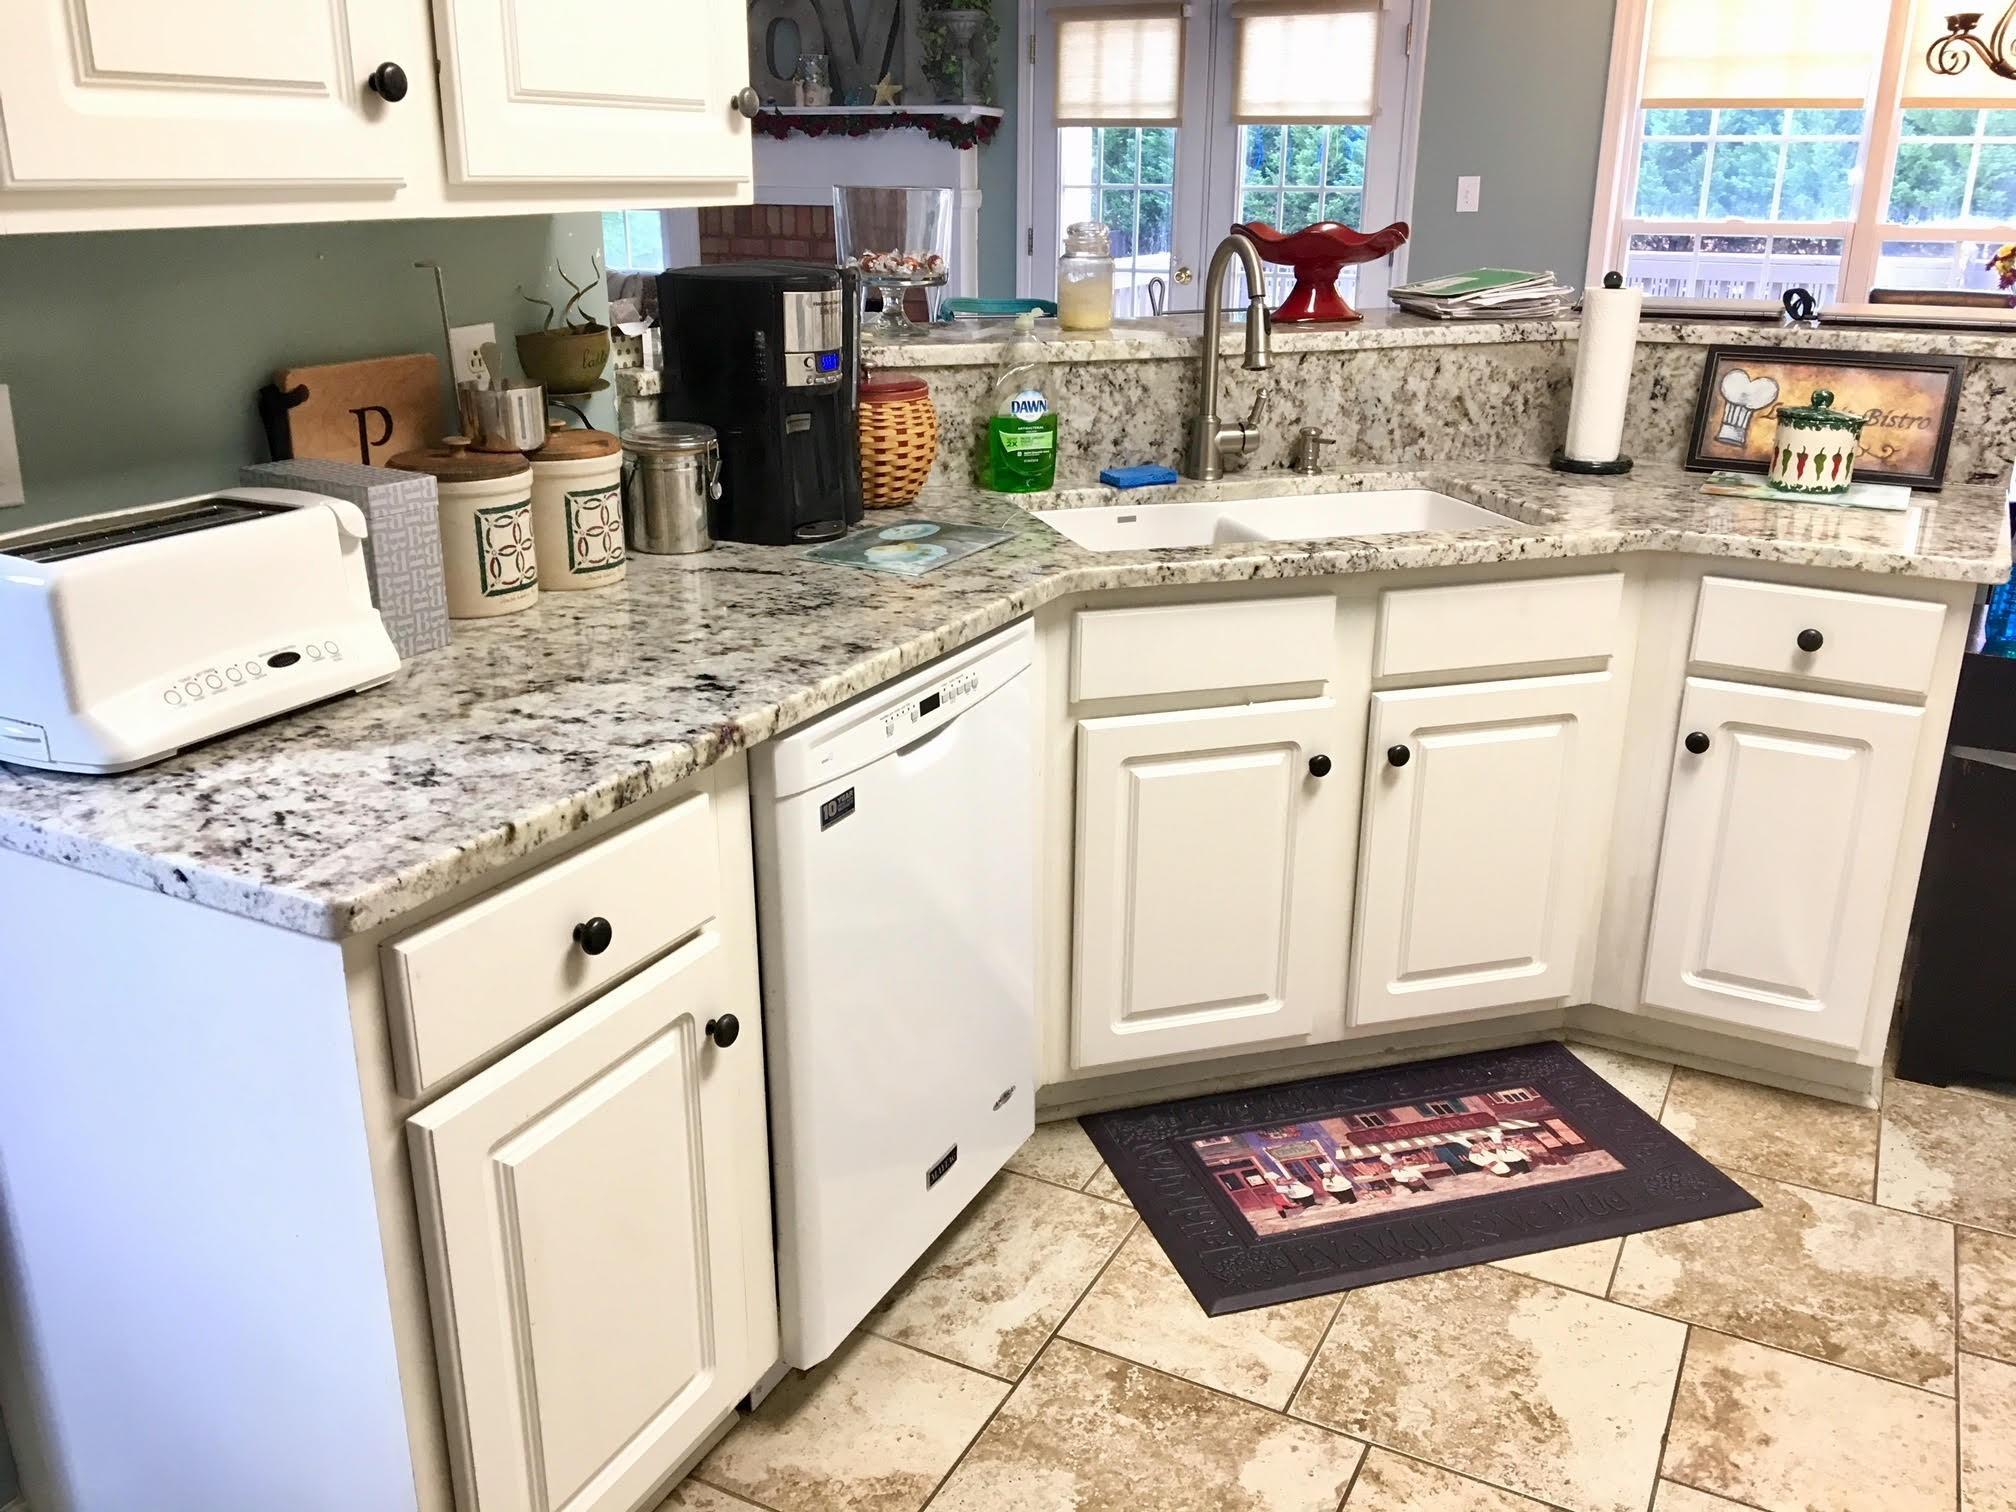 Ordinaire Buying Granite Countertops In 10 Easy Steps